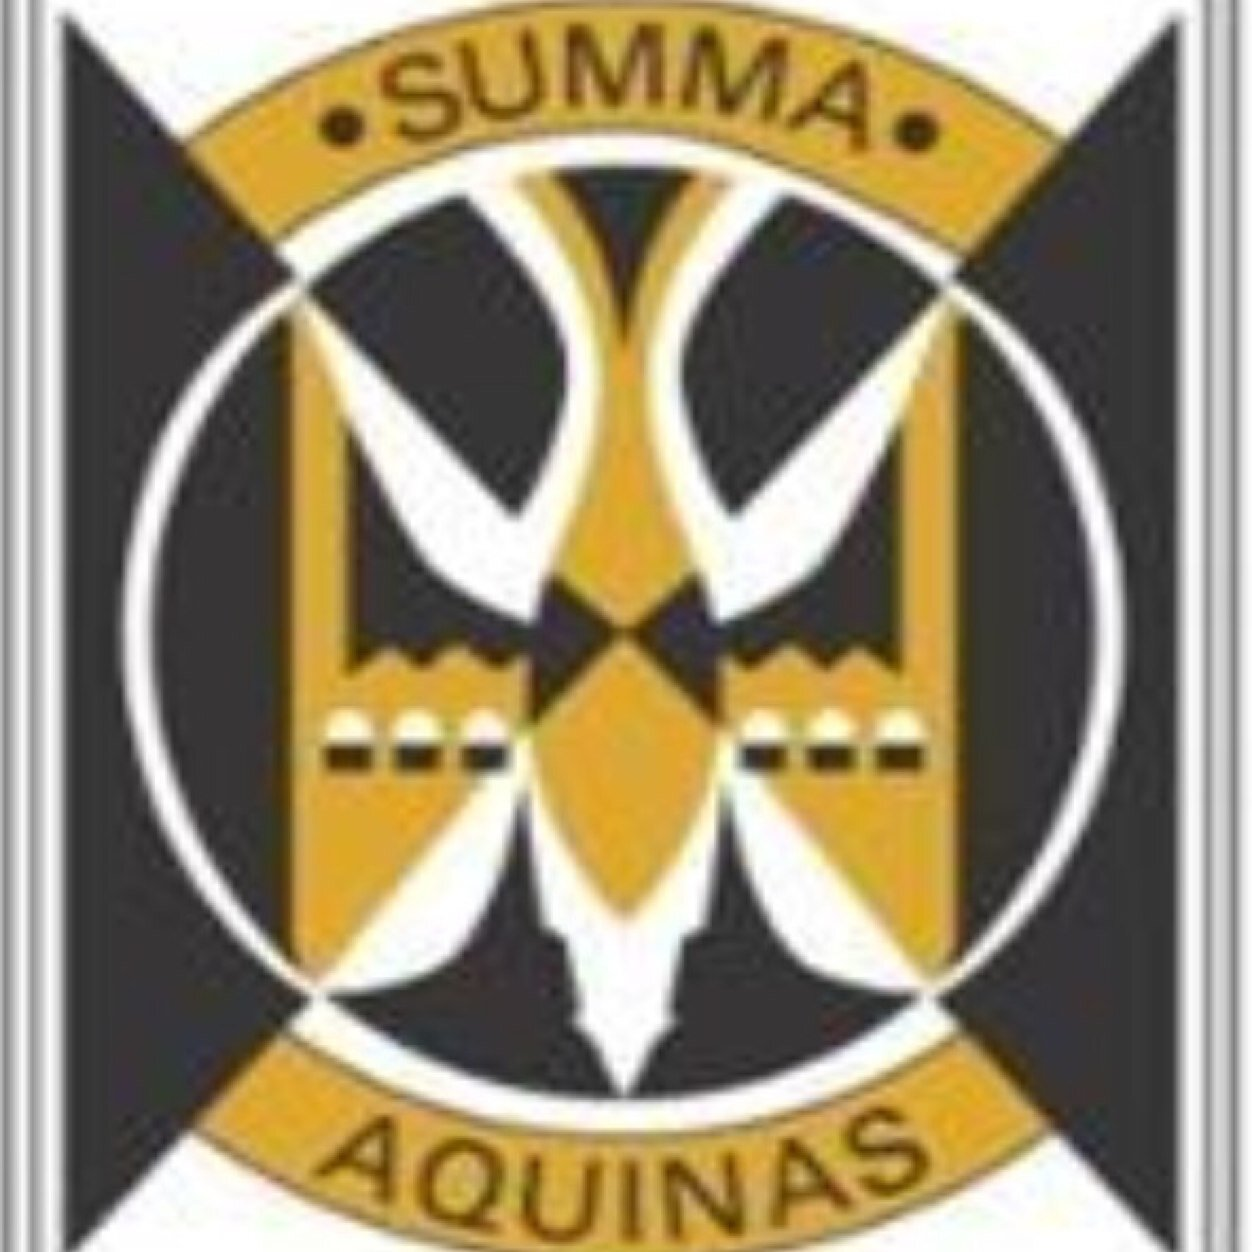 St Thomas Aquinas Pe Staphysed Twitter